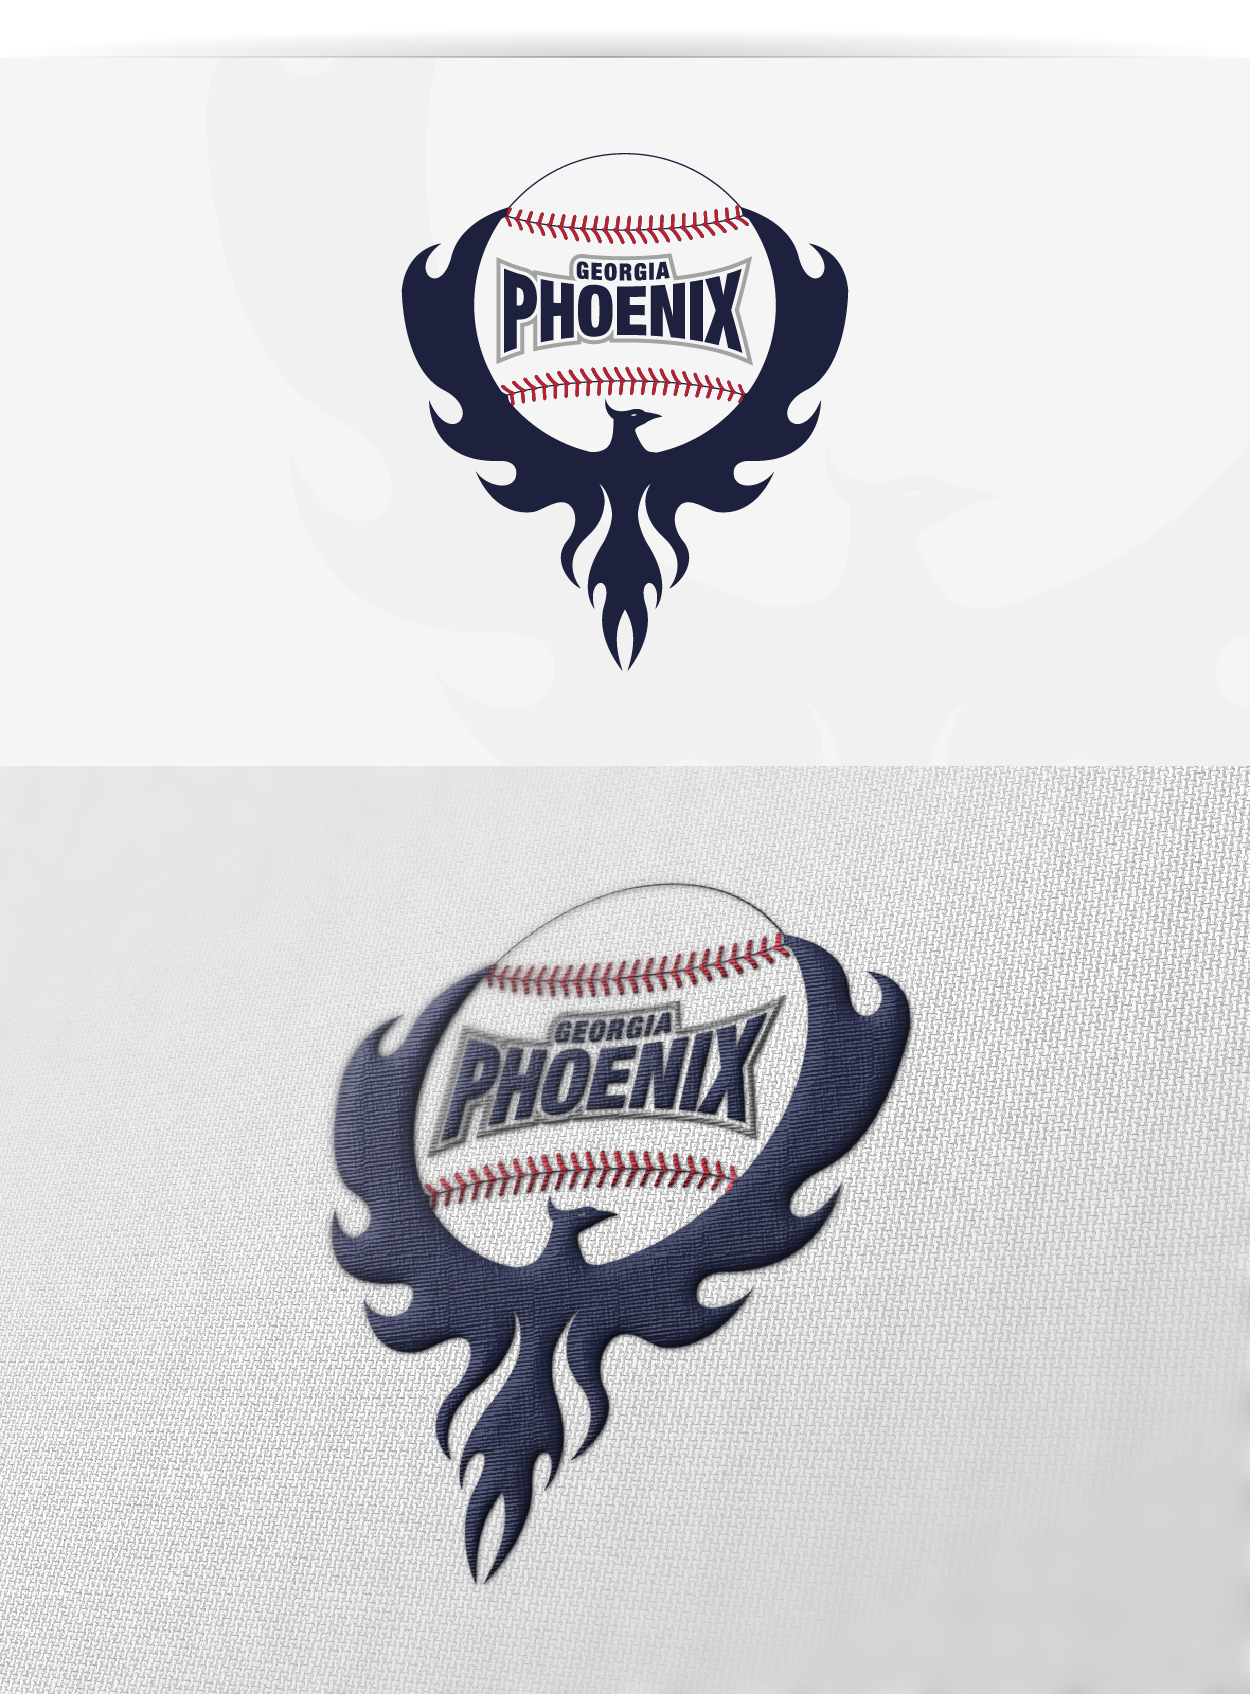 Help Georgia Phoenix  with a new logo